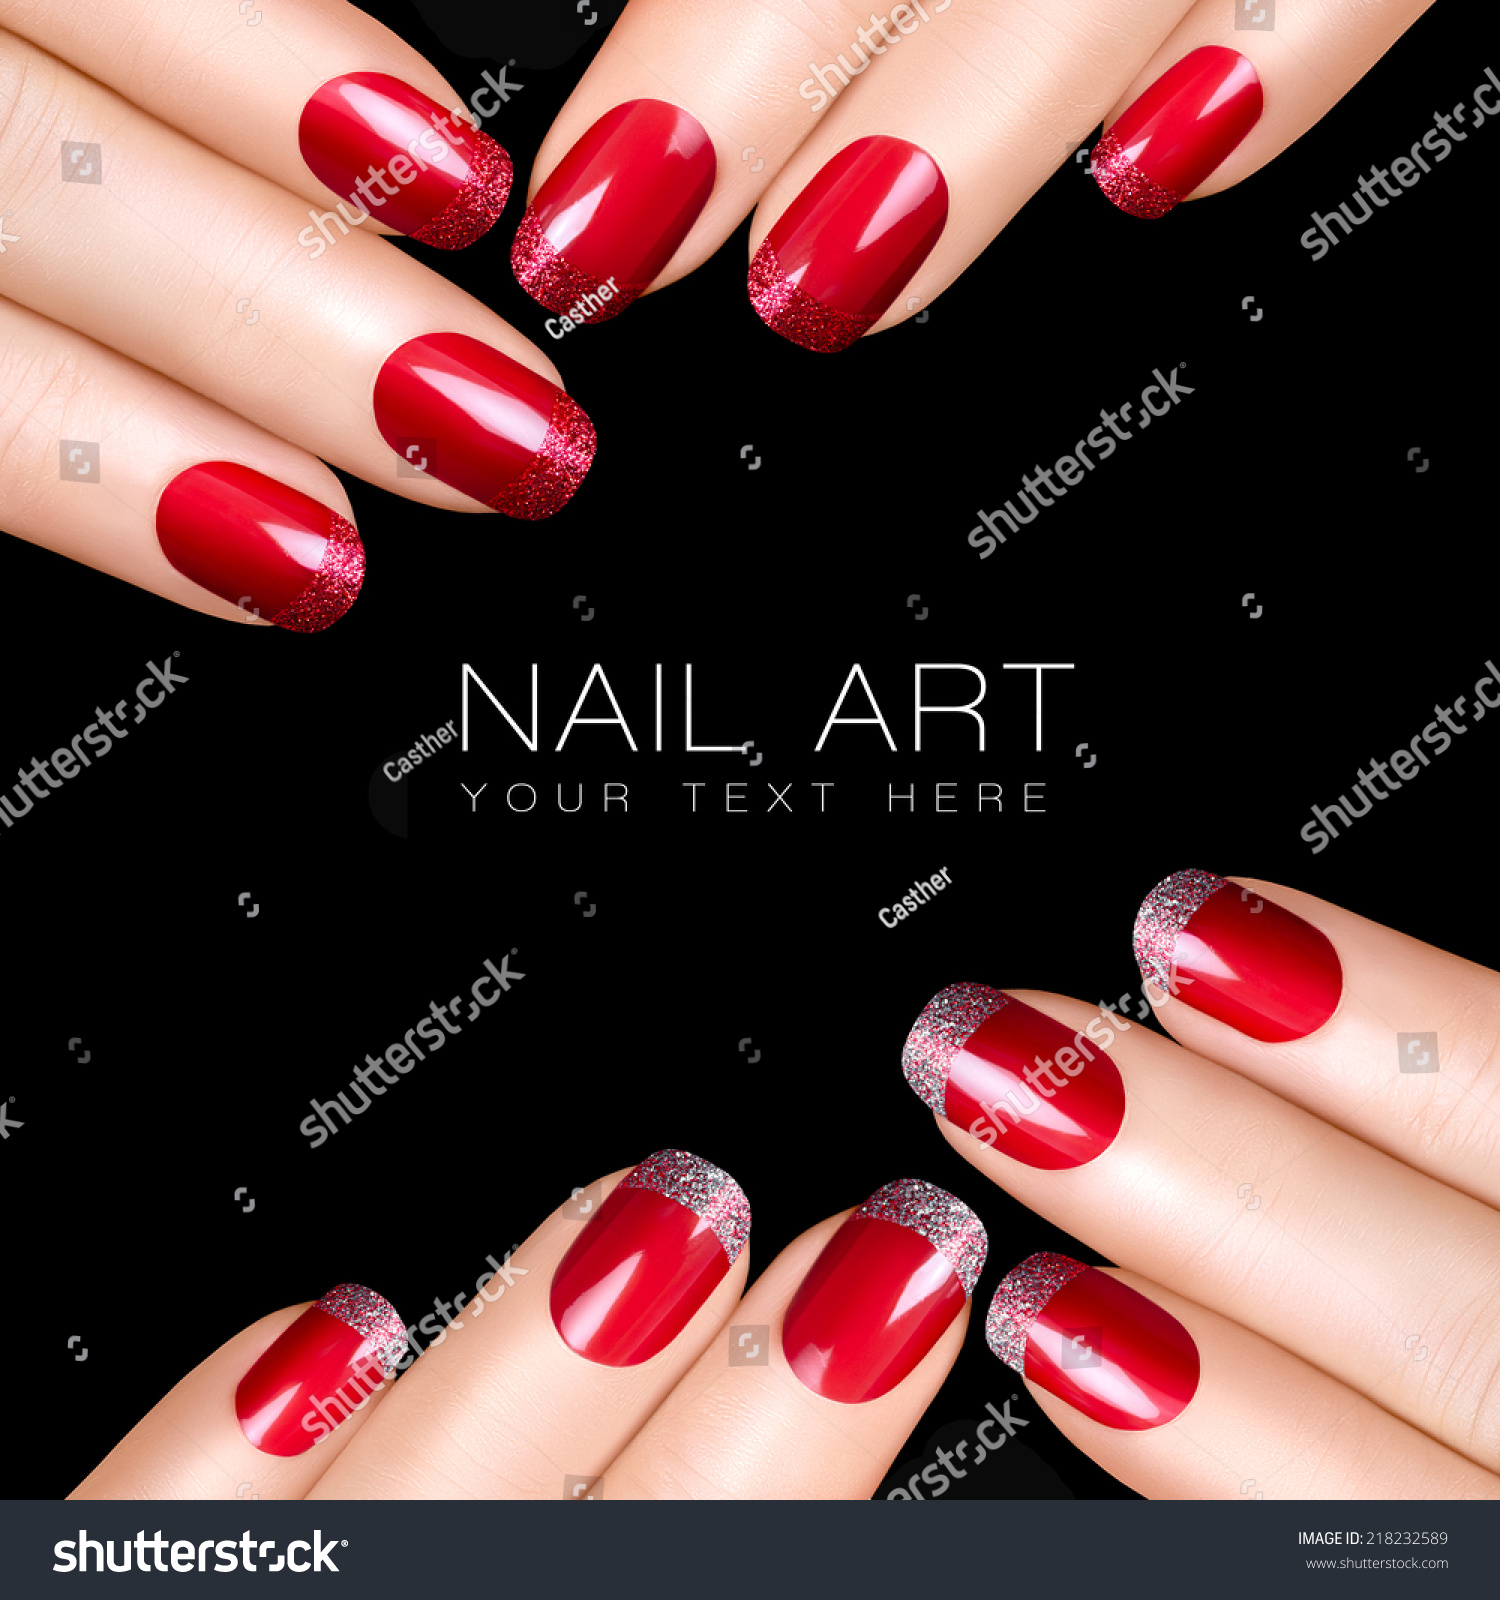 Trend Nail Art Luxury Nail Polish Stock Photo & Image (Royalty-Free ...